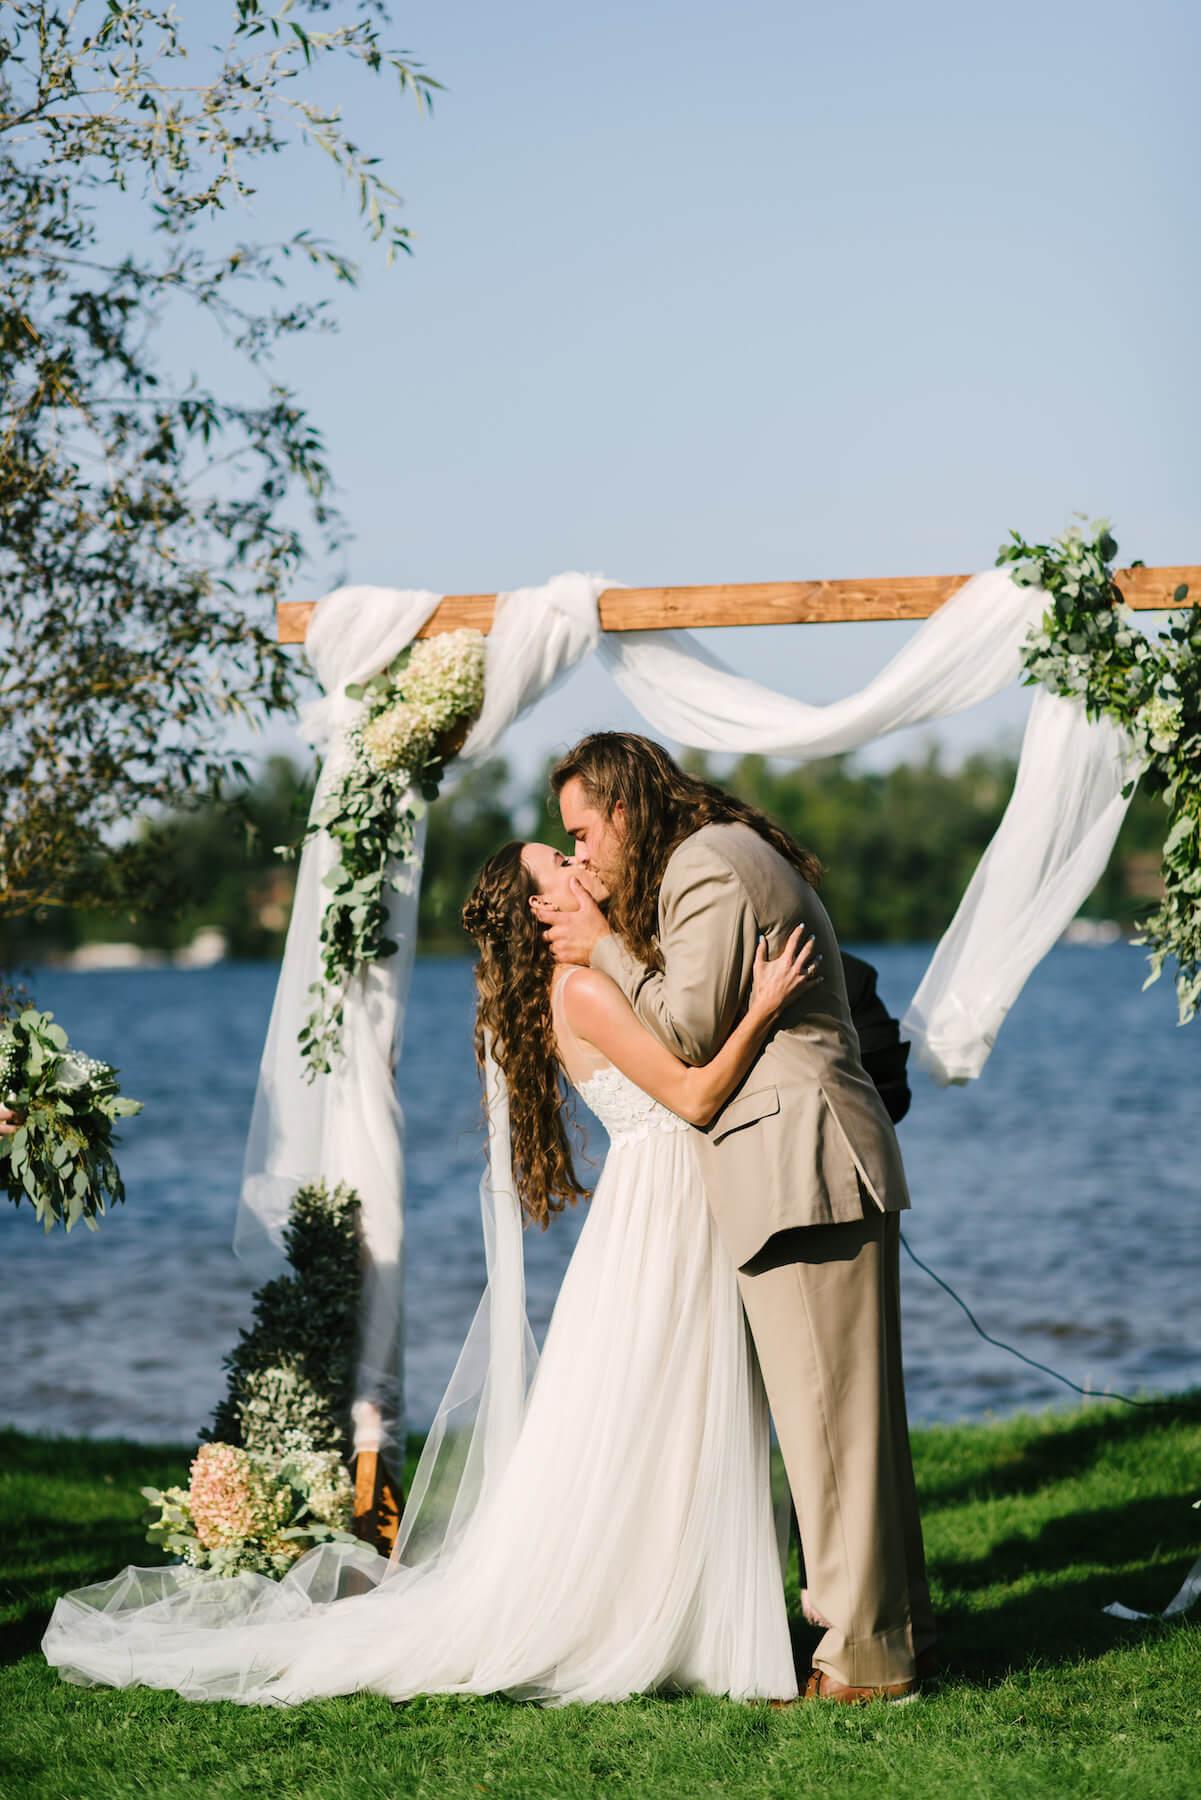 engle-olson-wedding-blair-taylor-29.jpg